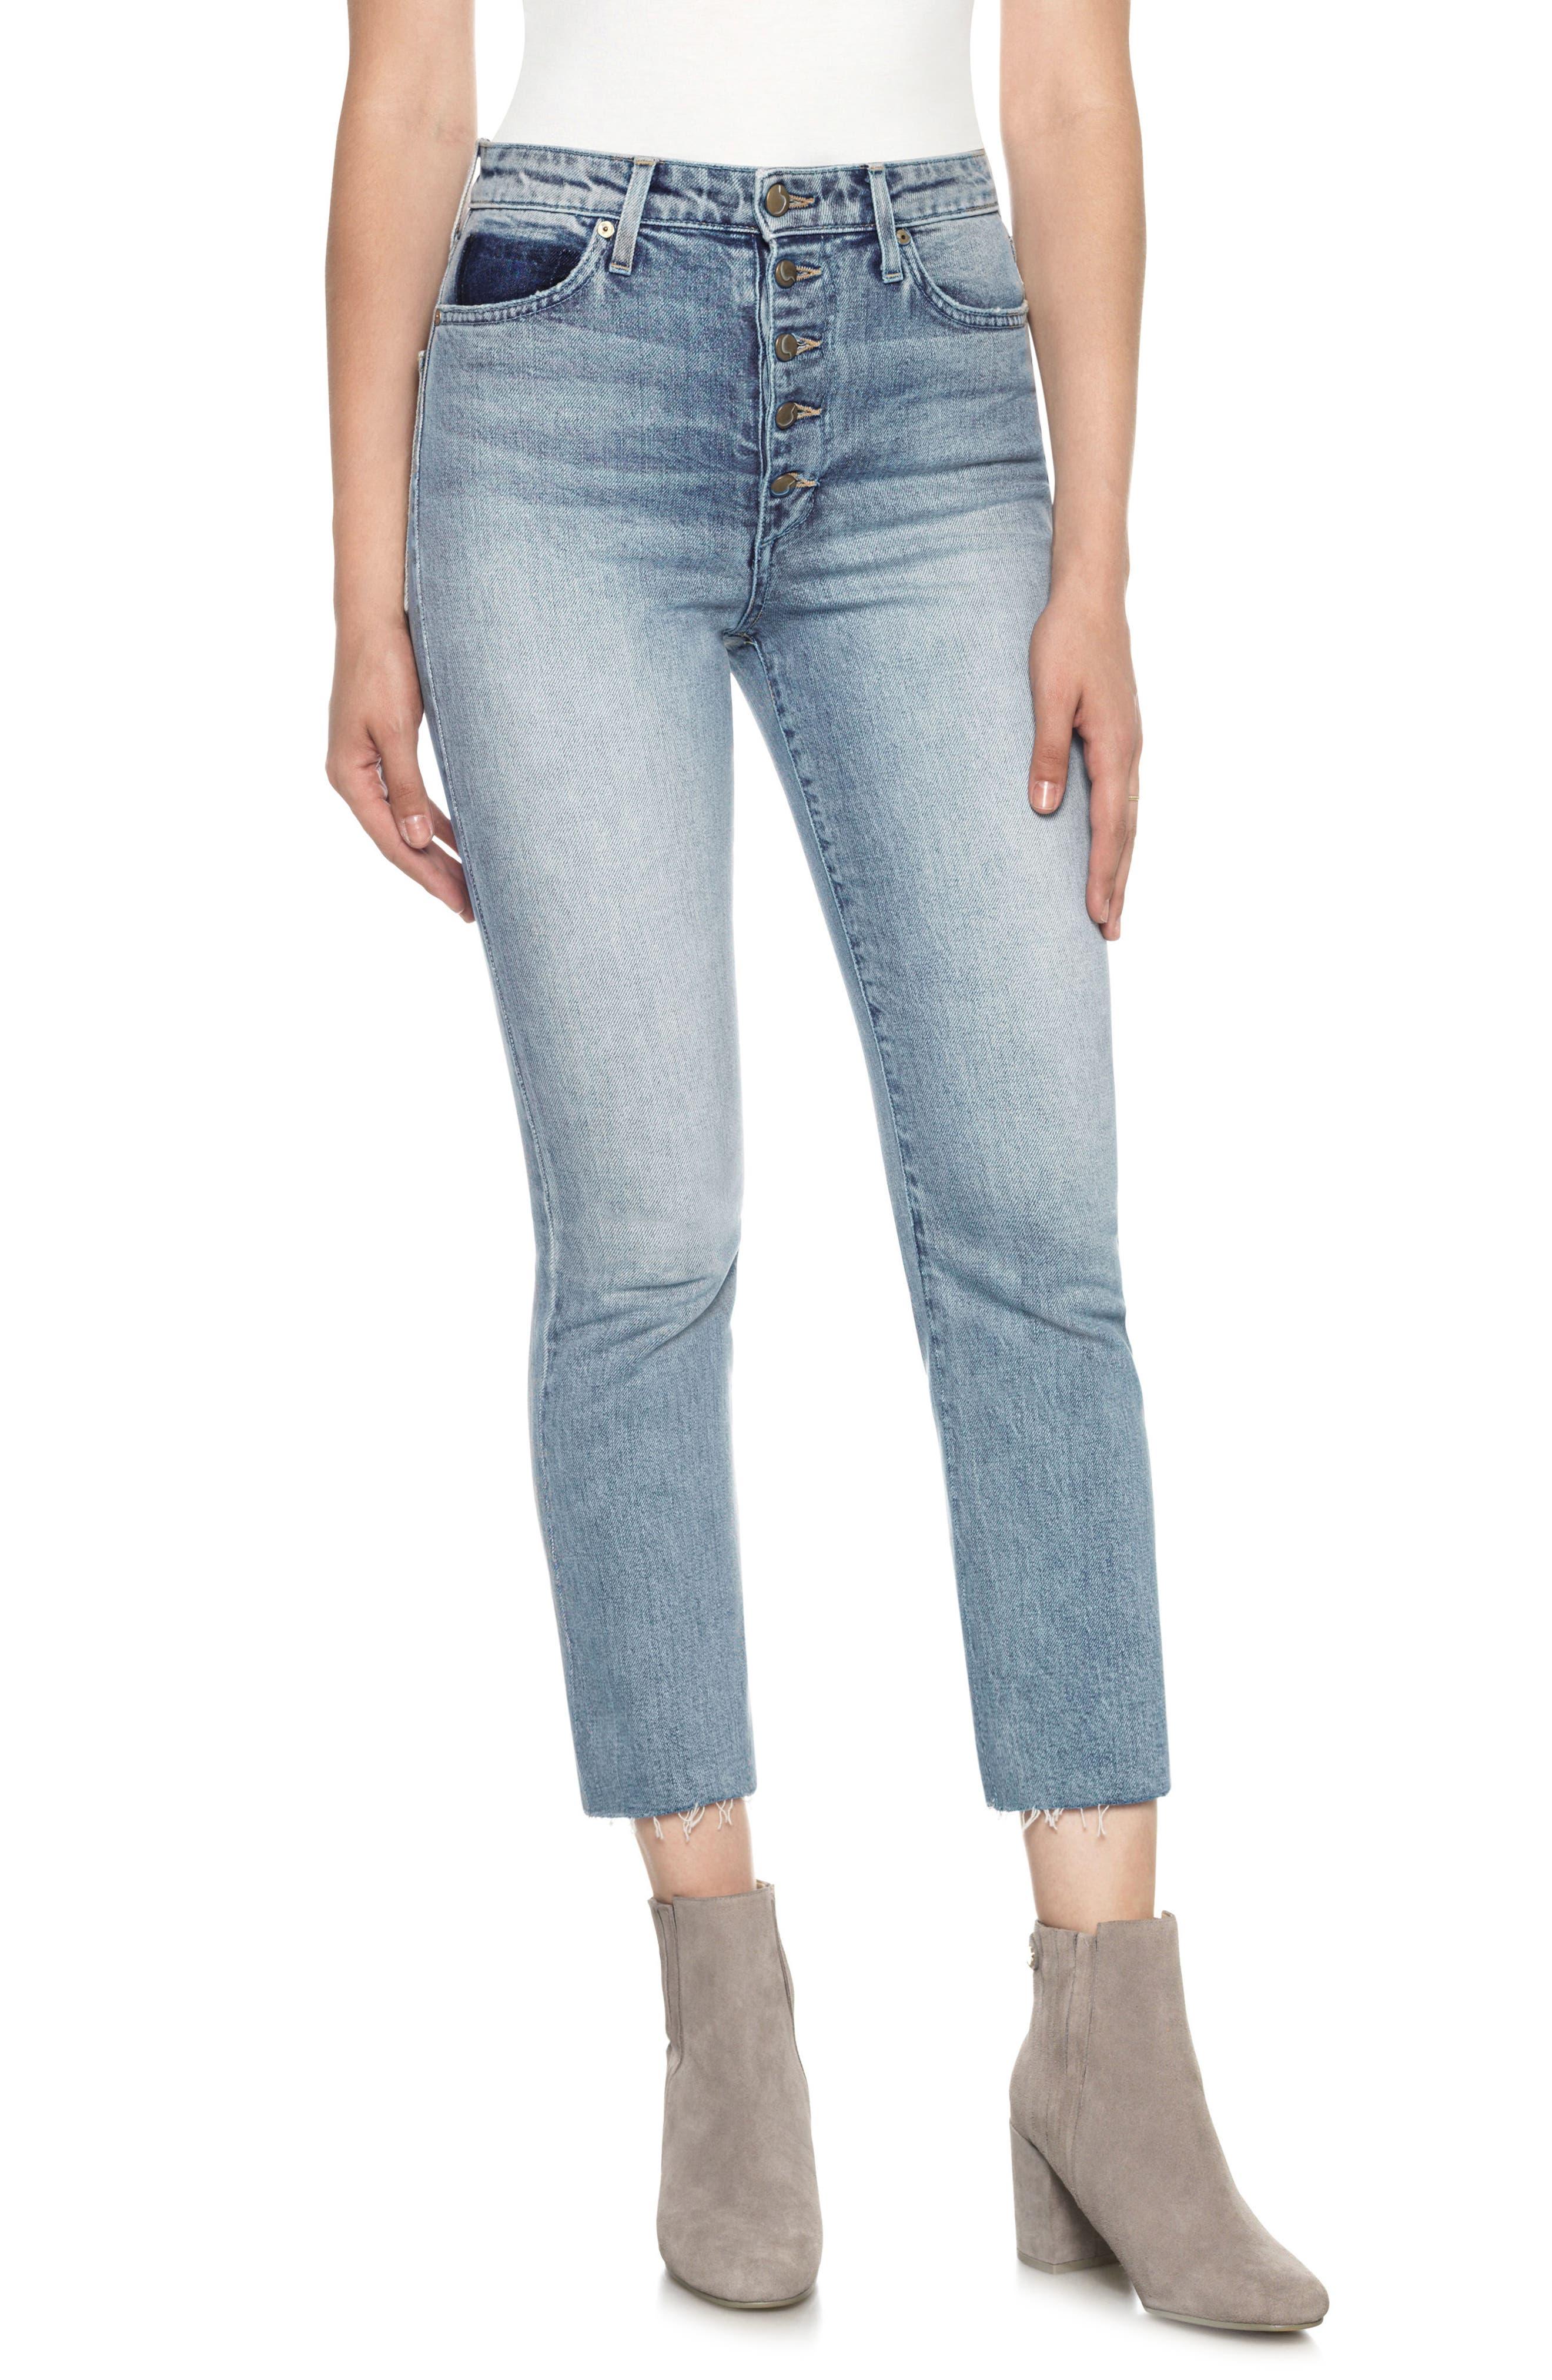 Debbie High Waist Crop Boyfriend Jeans,                         Main,                         color, Kamryn